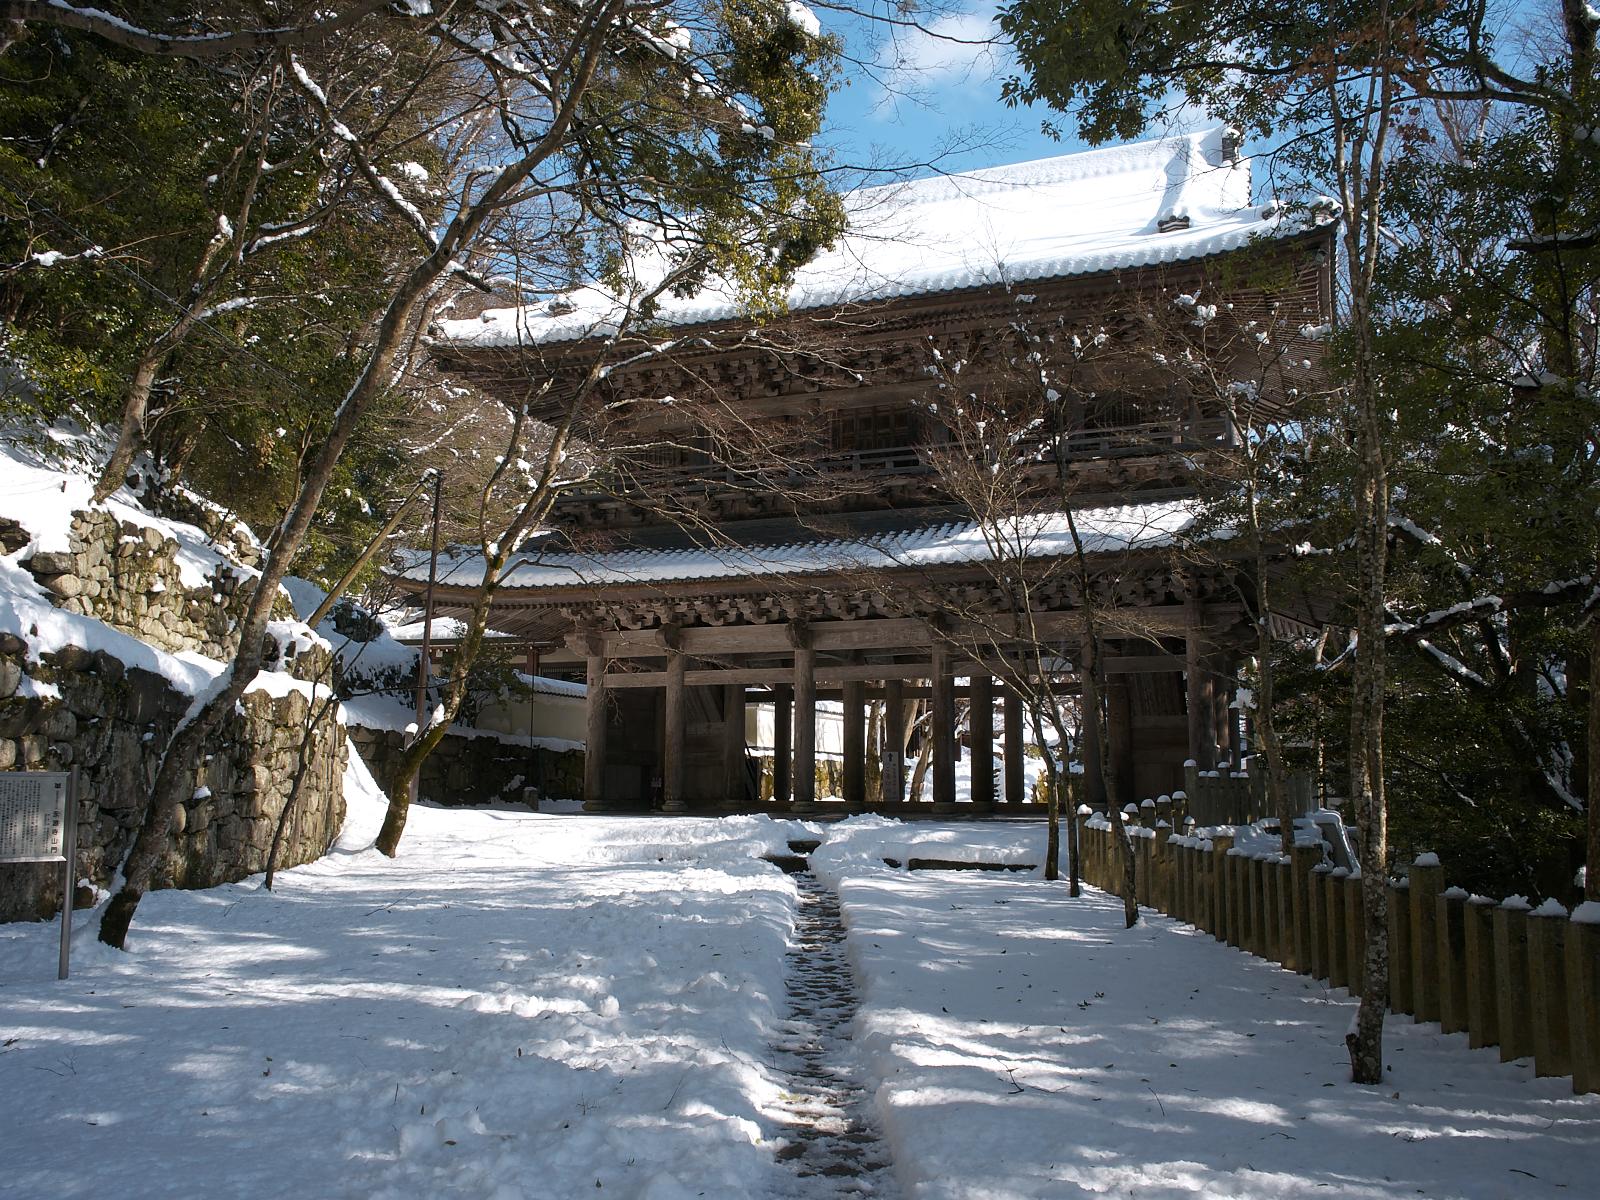 http://www.eigenji-t.jp/admission/images/R0010094.jpg